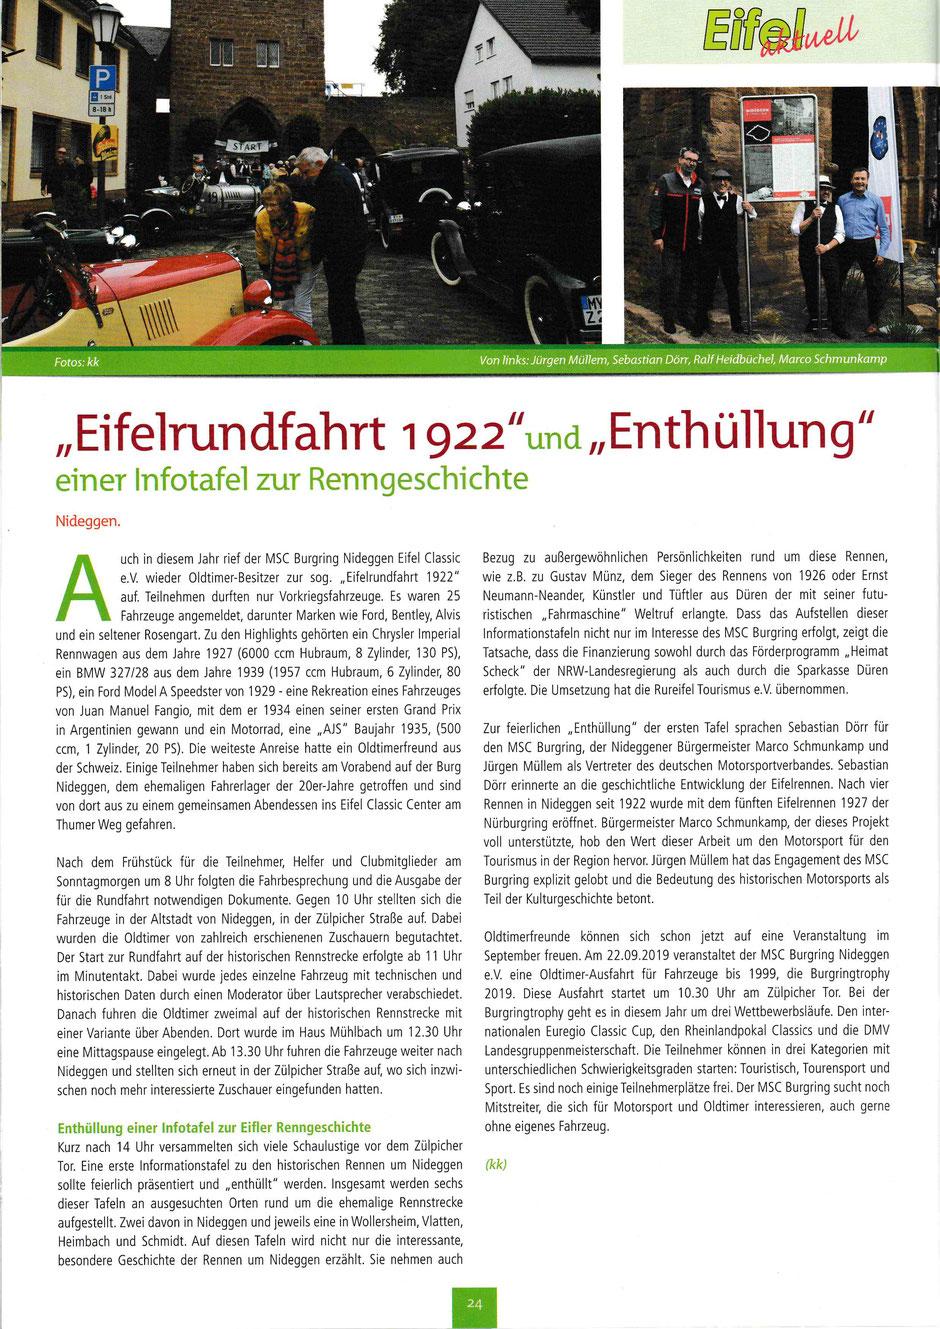 Eifel Aktuell/ August 2019